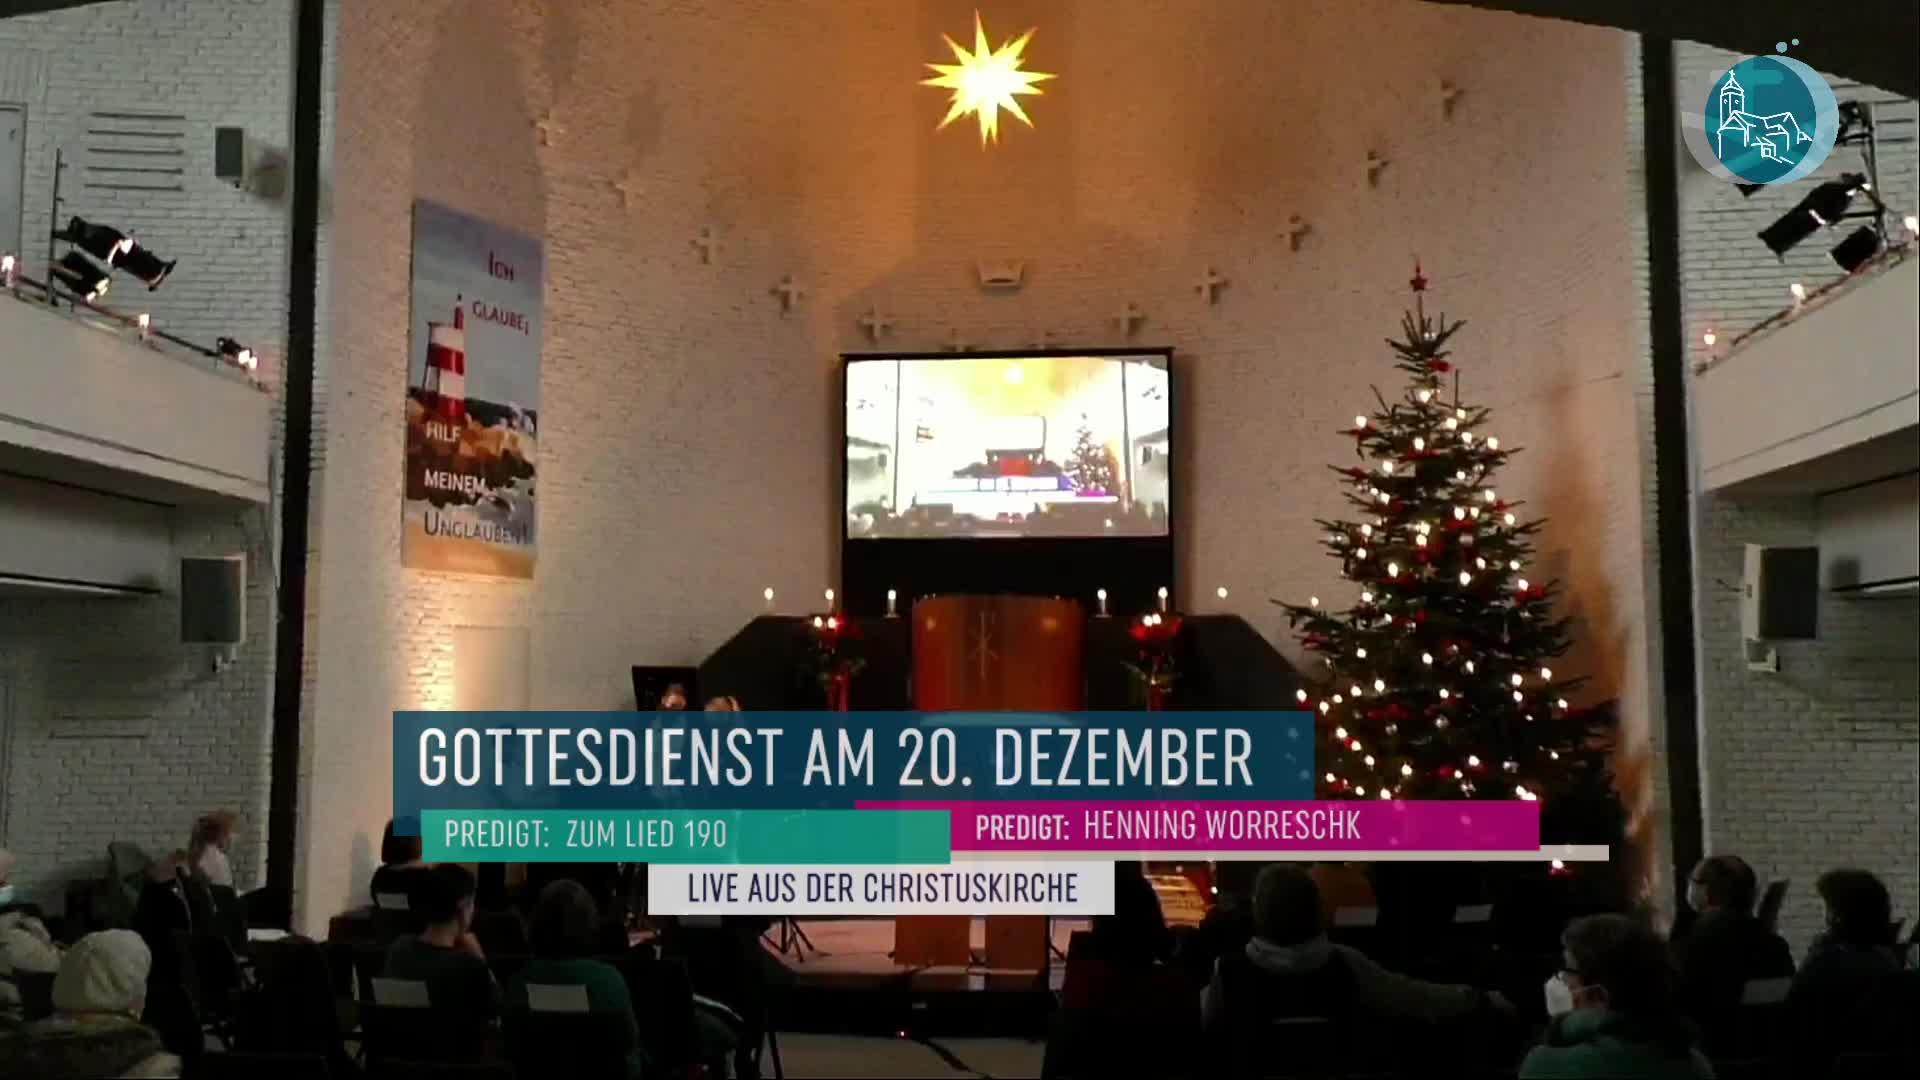 Gottesdienst am 20. Dezember - Livestream aus der Christuskirche Altona am 4. Advent